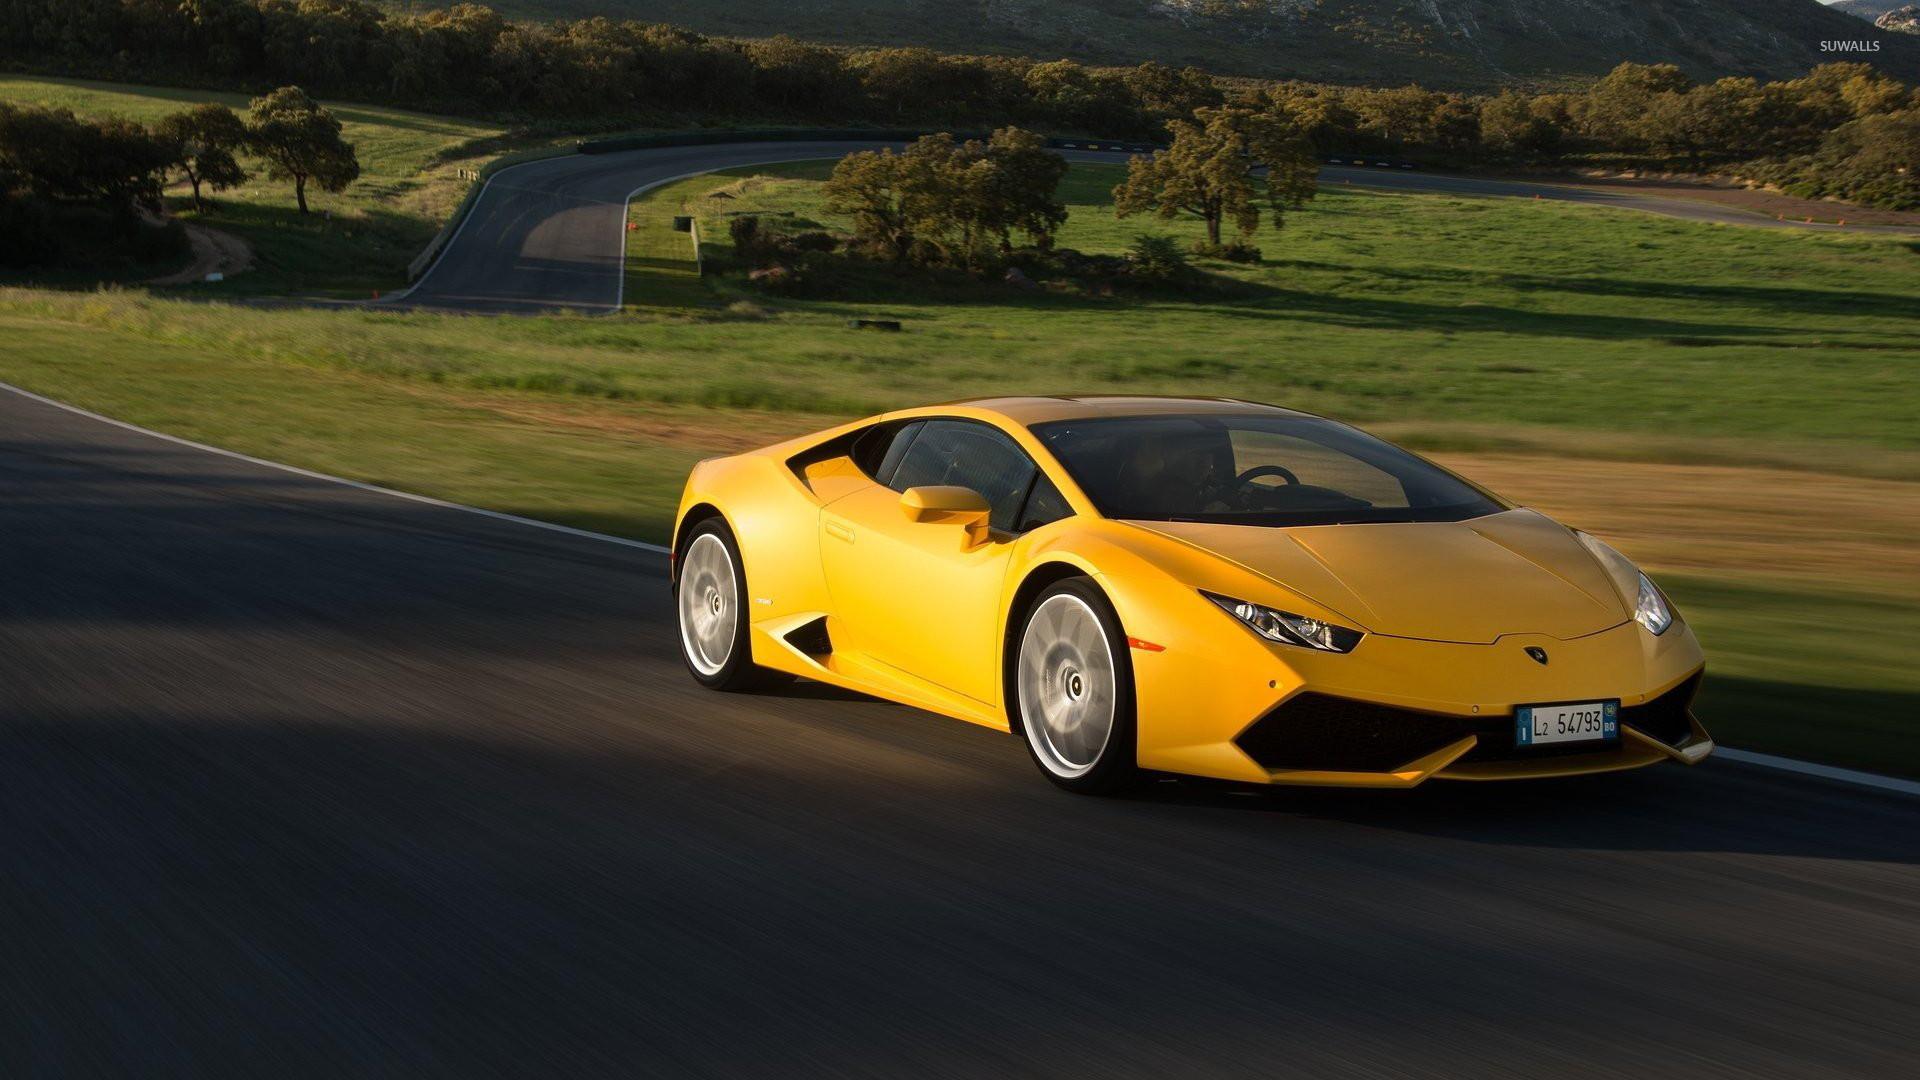 Lamborghini Huracan Wallpapers And Backgrounds